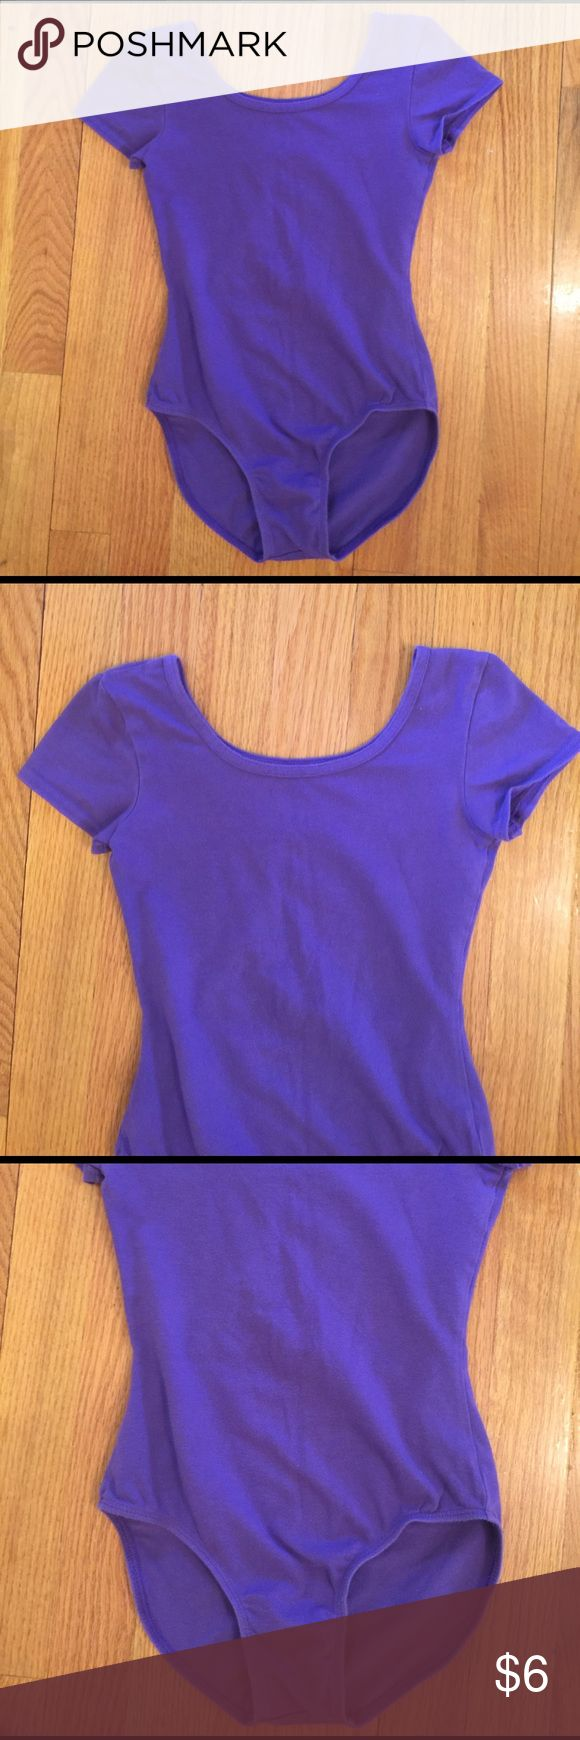 Girl's Danskin Purple Leotard Size 7/8 Girl's Danskin Purple Leotard Size 7/8. 95% Cotton, 5% Spandex. Excellent condition. Short sleeve. Danskin Now Other